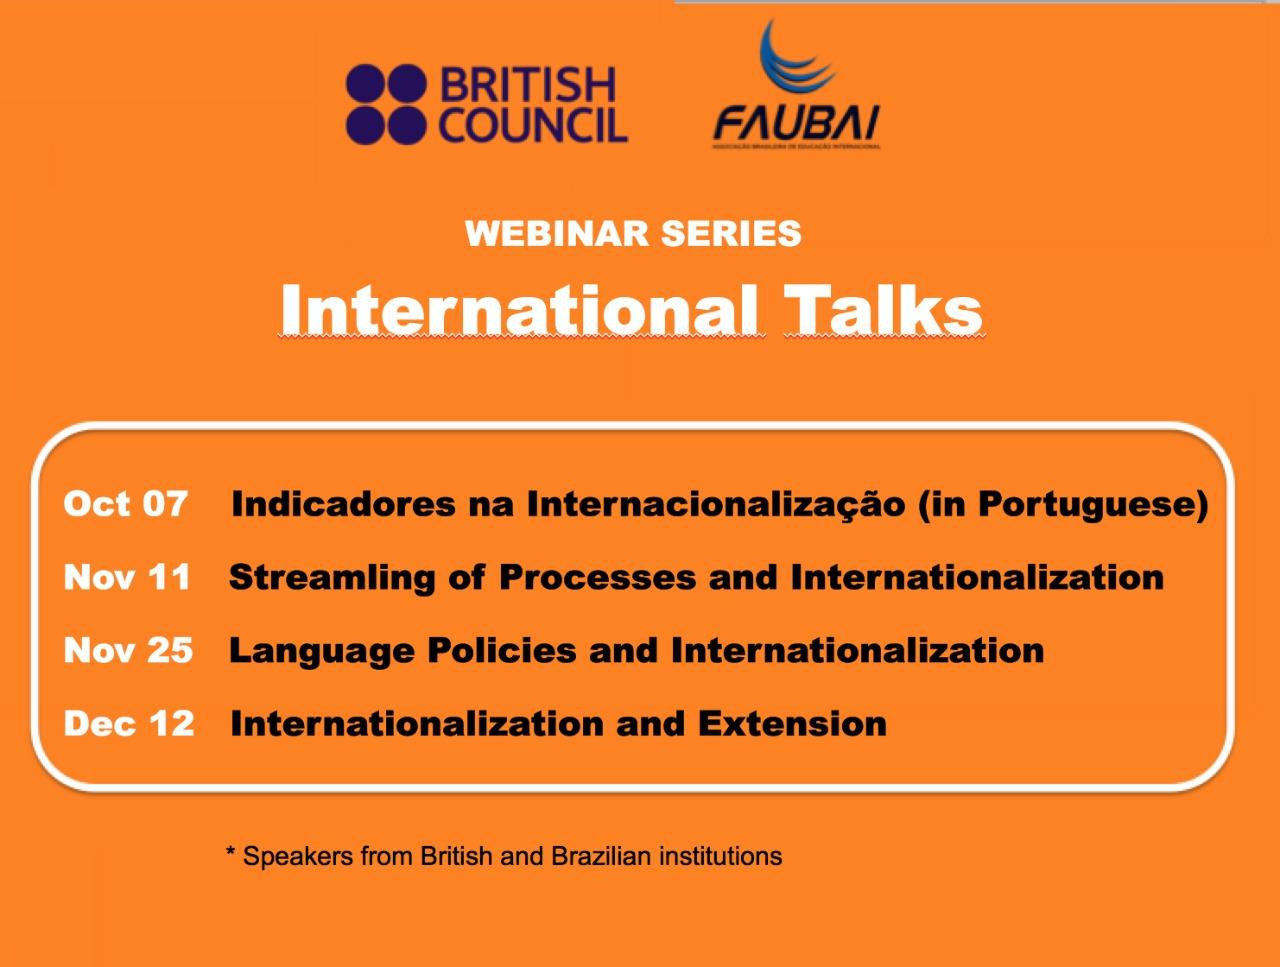 International Talks